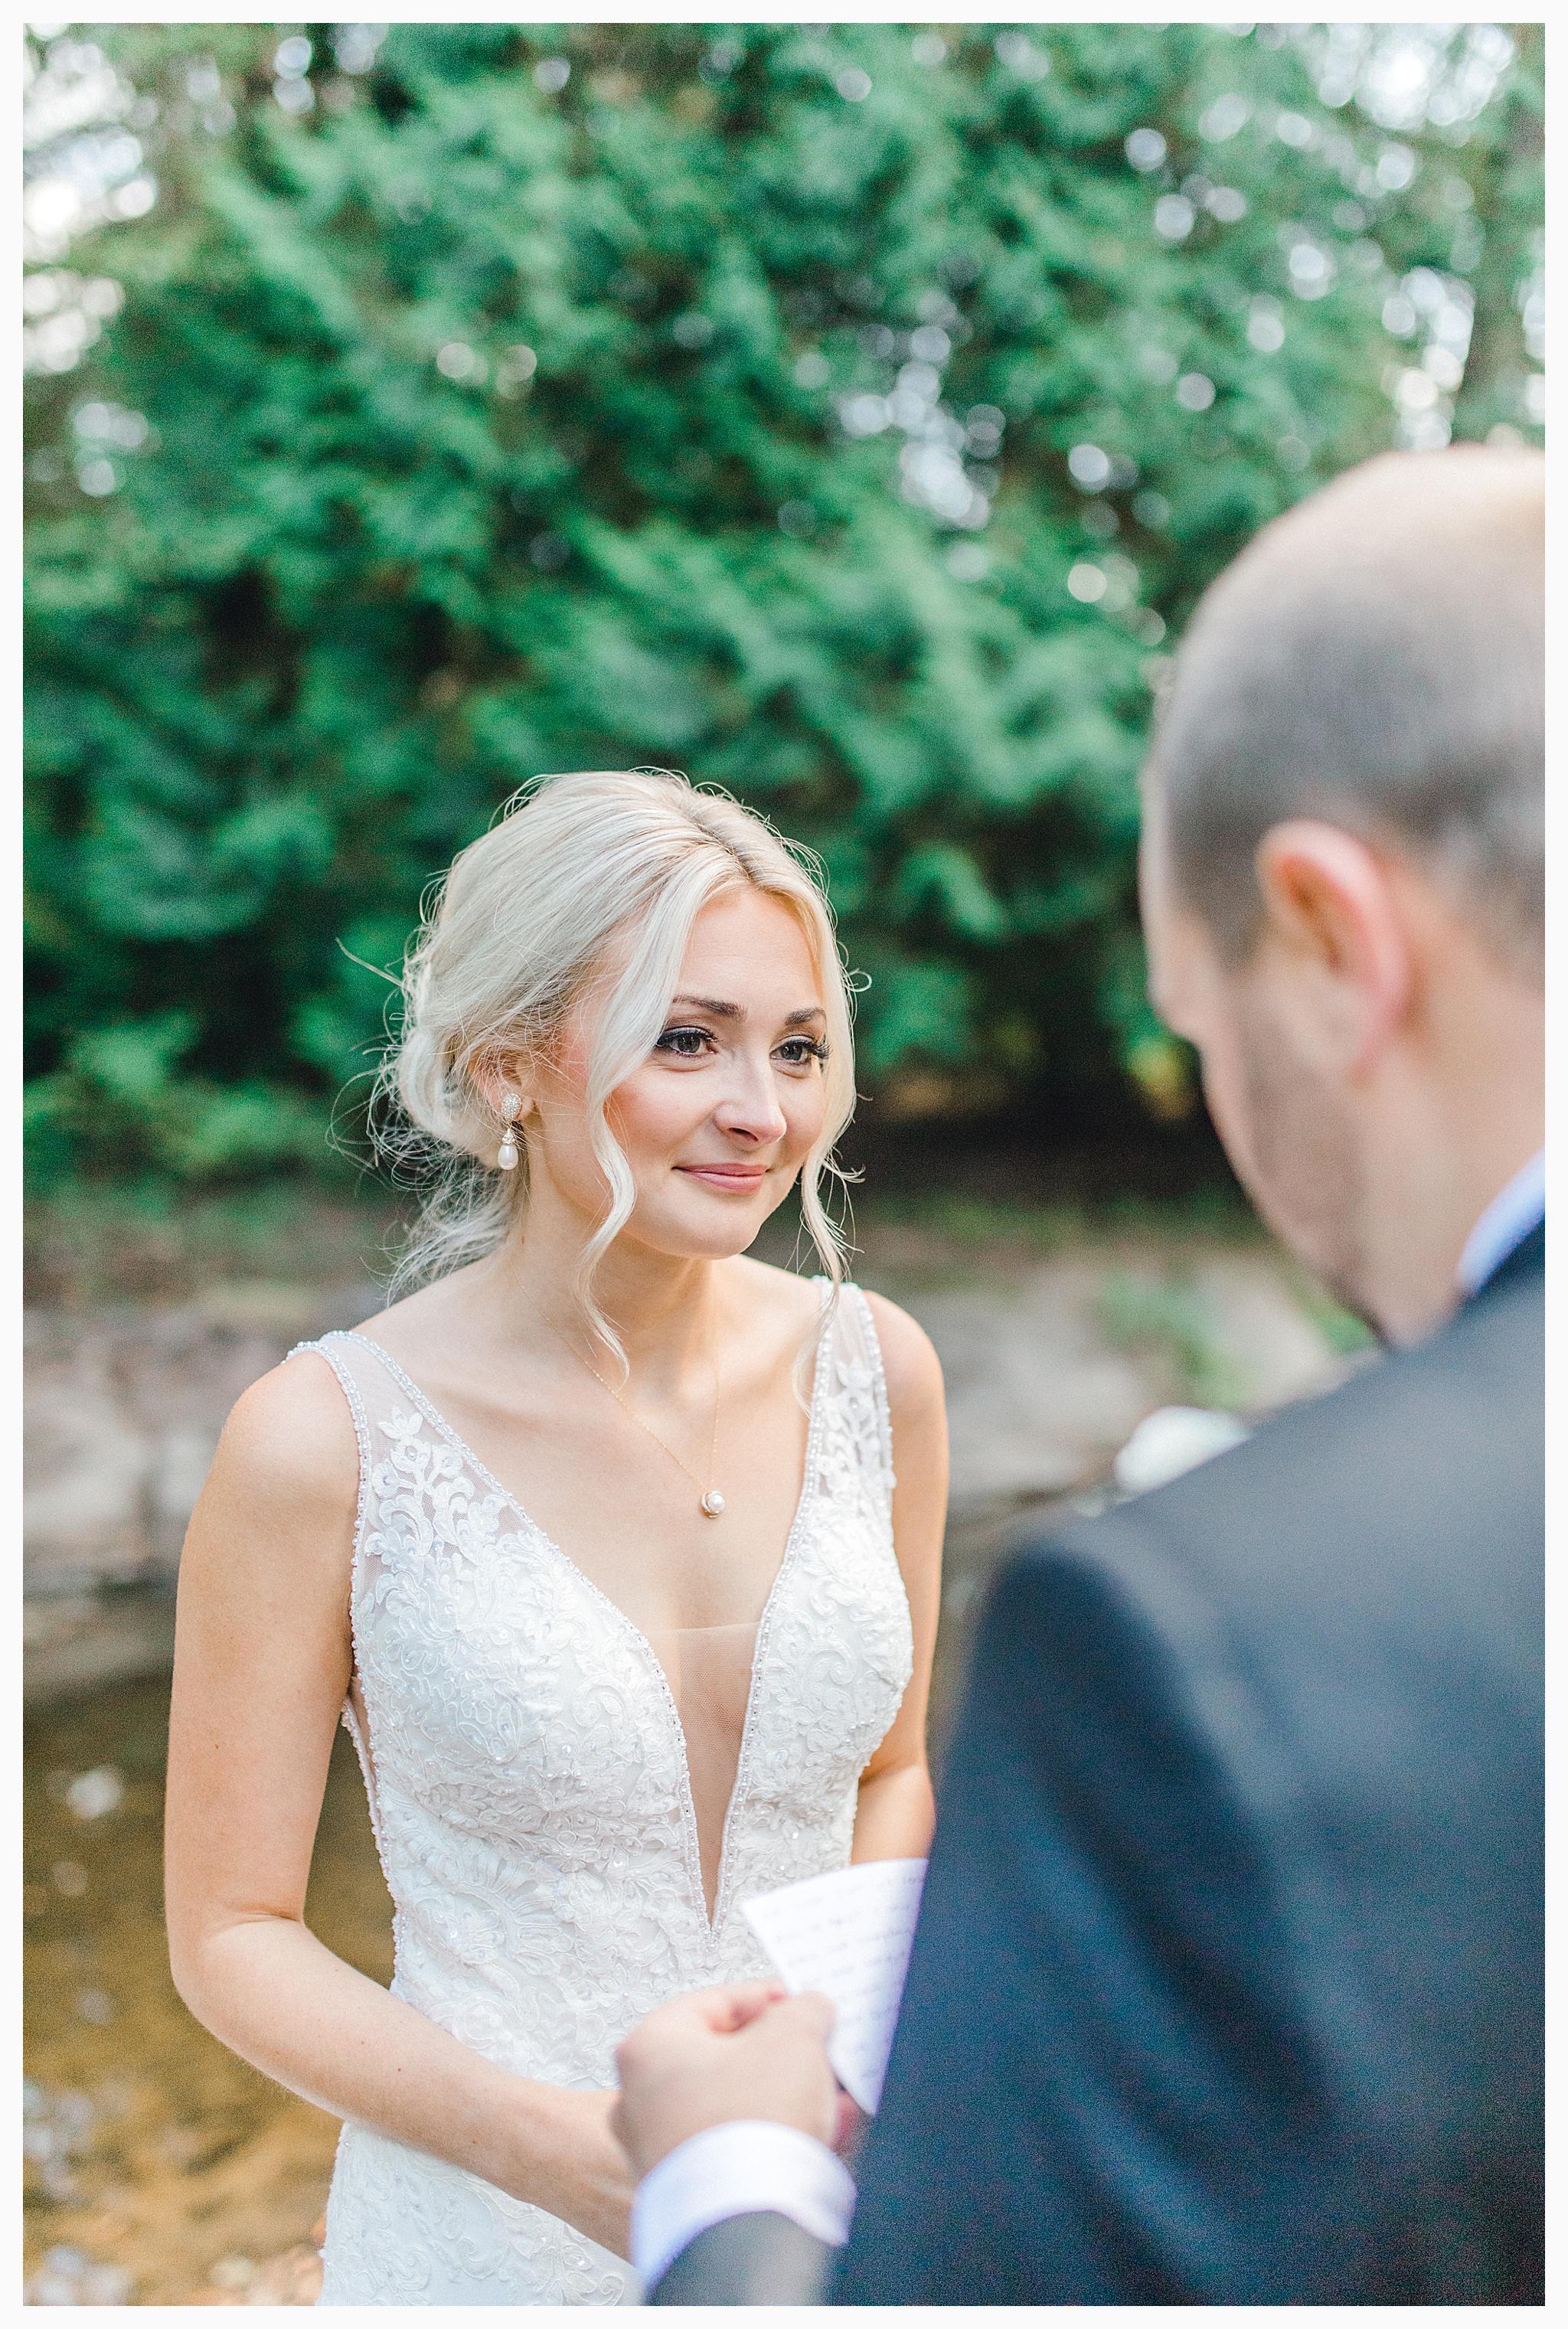 Emma Rose Company Light and Airy Wedding Photographer, Beautiful fall wedding at Rock Creek Gardens Venue in Puyallup, Washington._0030.jpg